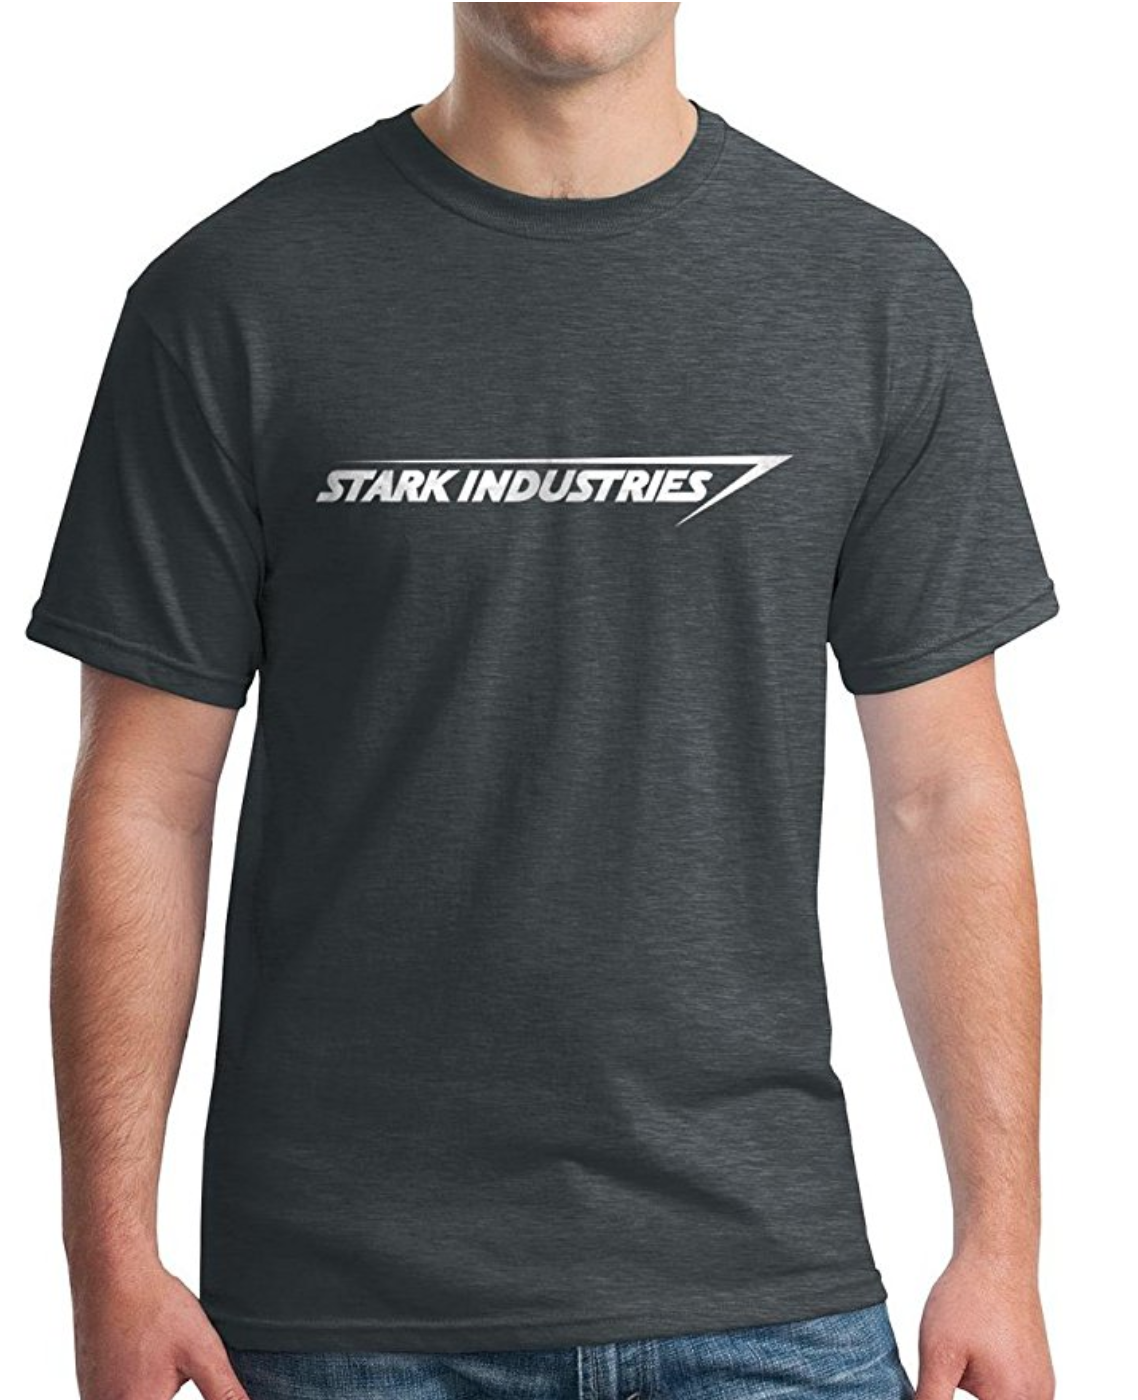 Dark Grey TShirt with Stark Industries Logo Model